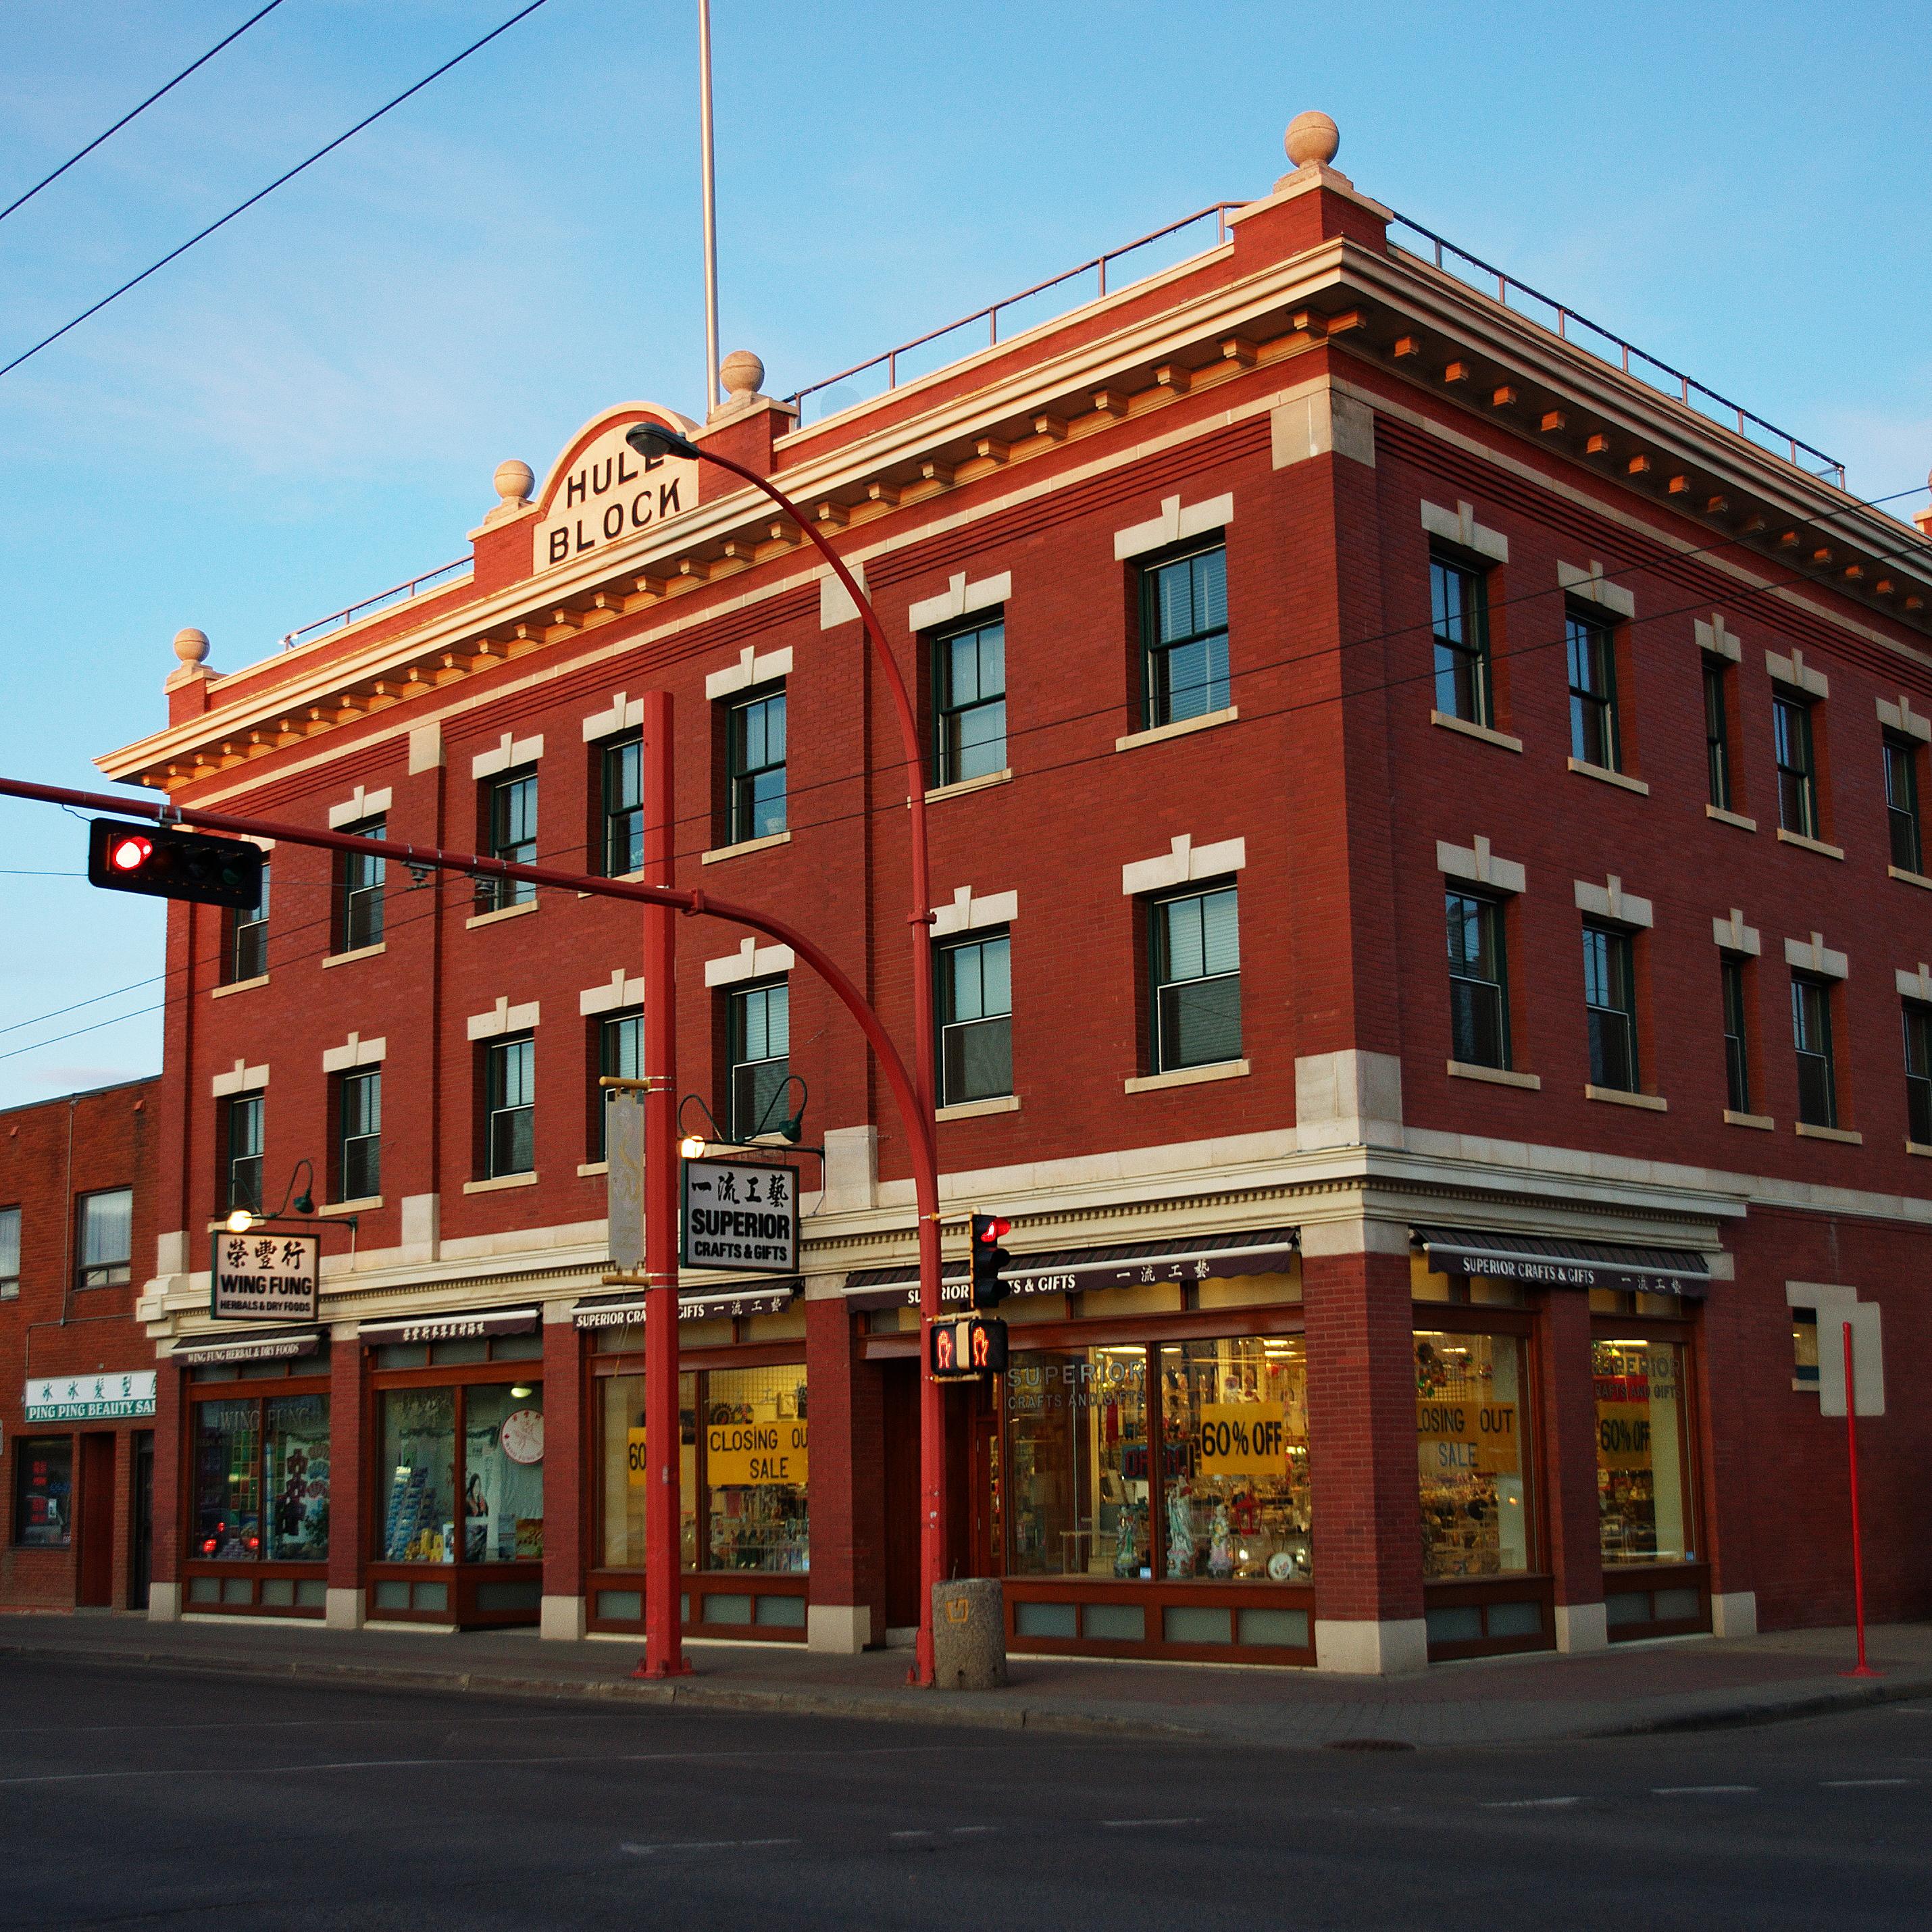 File:Hull Block Edmonton.jpg - Wikimedia Commons